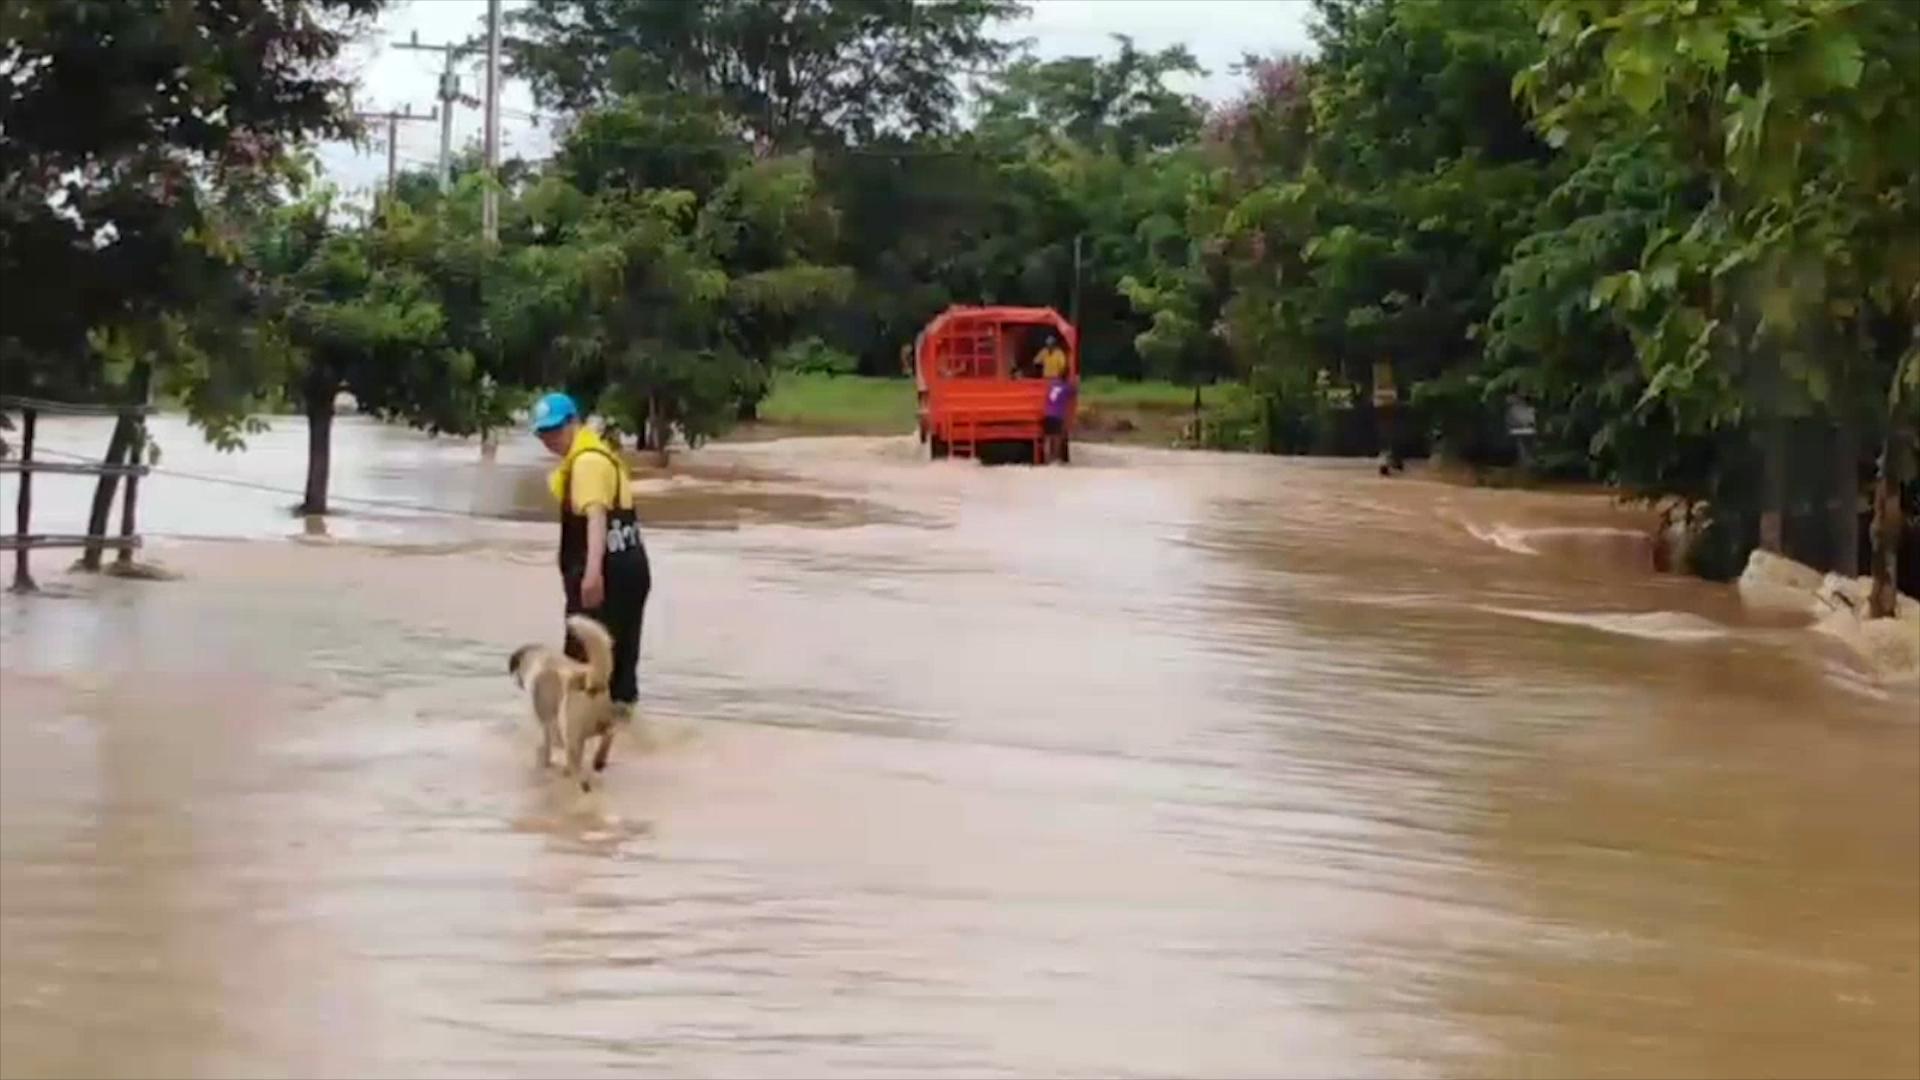 Dogilike.com :: ประทับใจ! จิตอาสา อุ้มน้องหมาฝ่ากระแสน้ำเชี่ยวที่พิษณุโลก